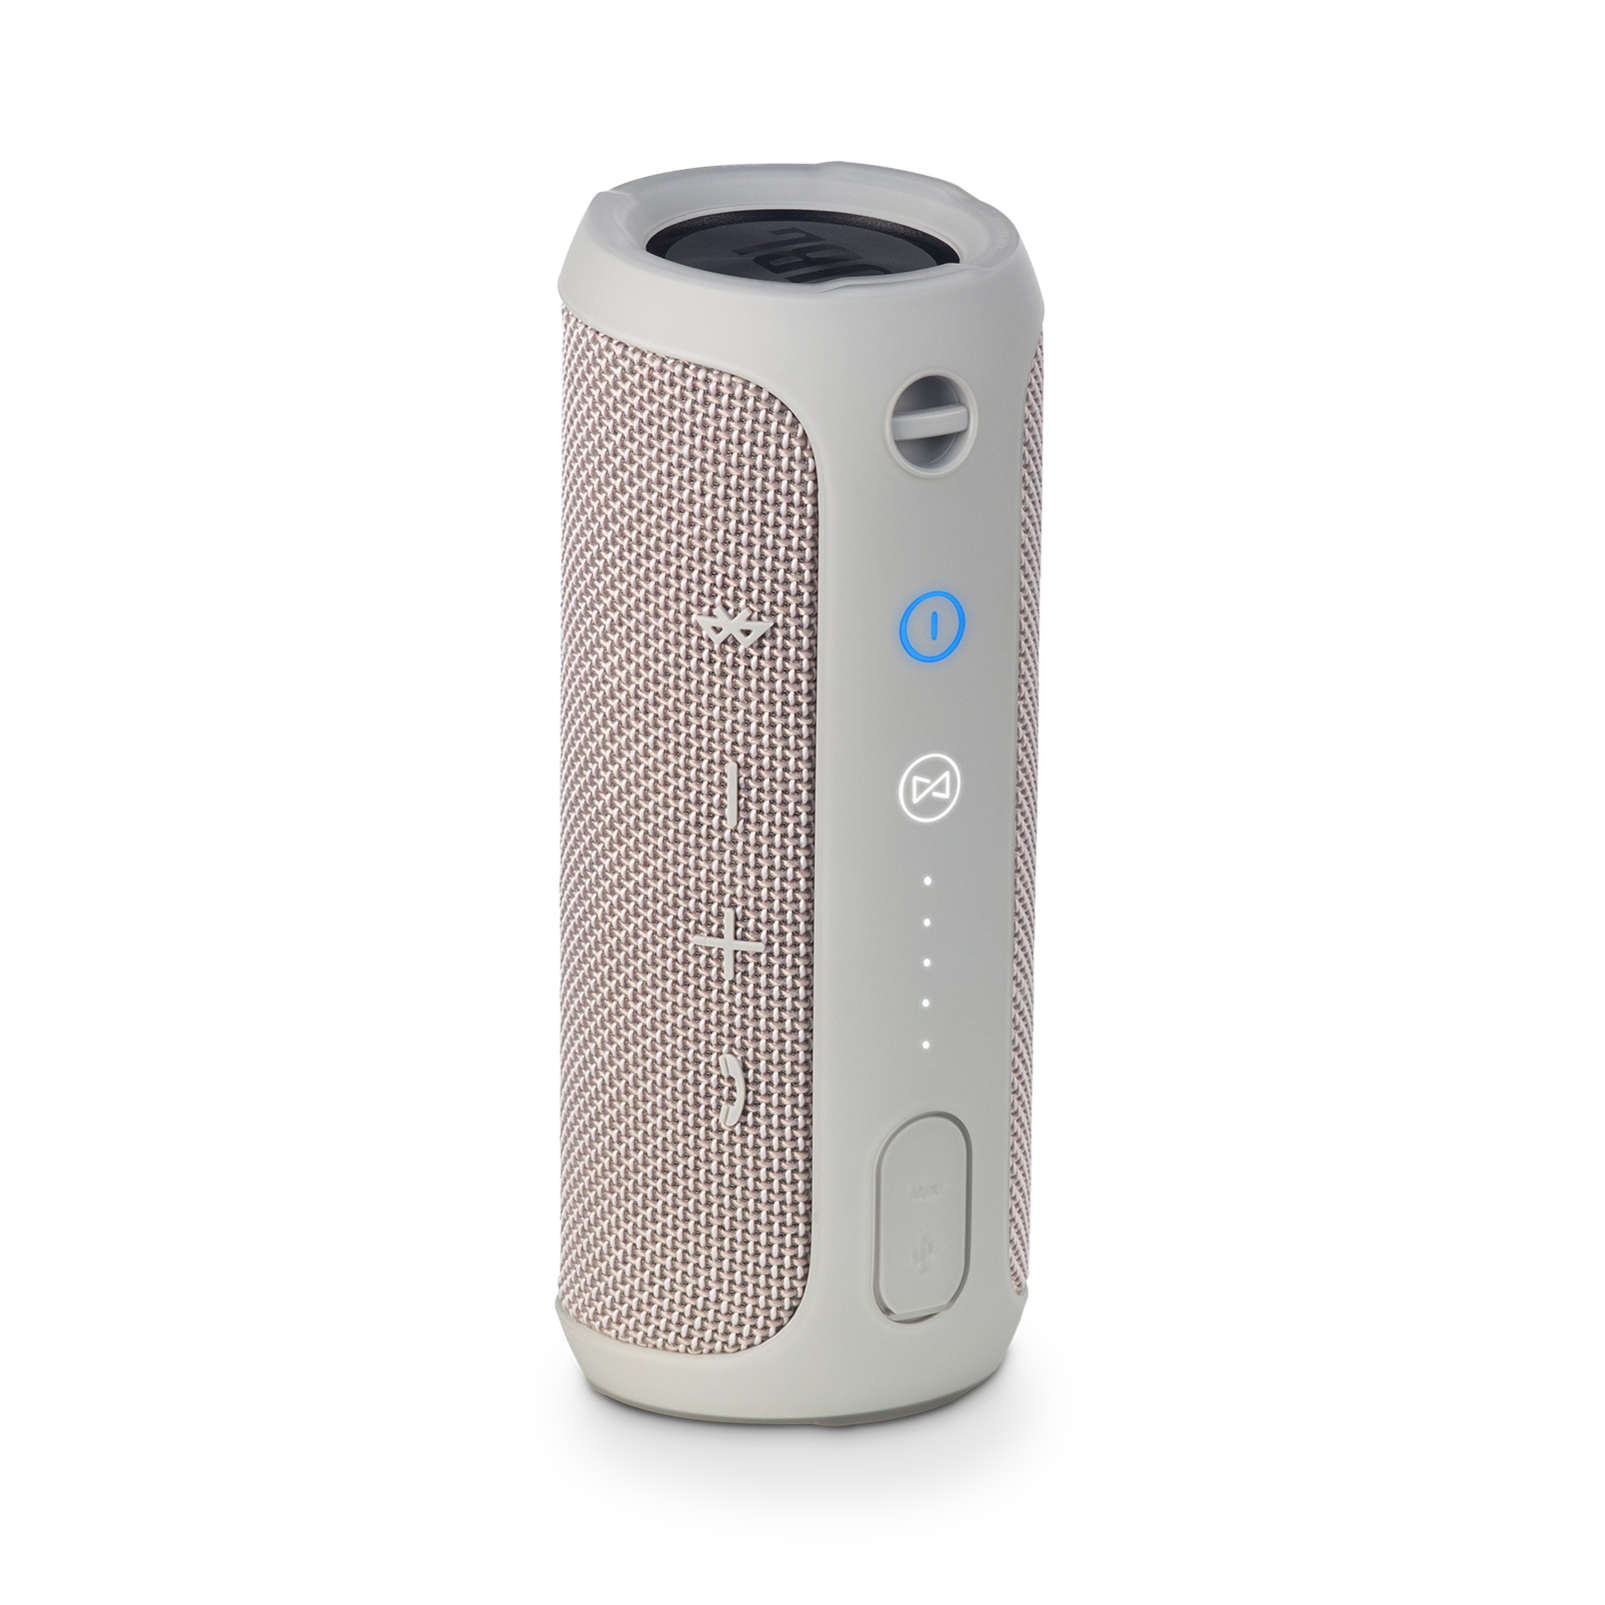 JBL Flip 3 - Grey - Splashproof portable Bluetooth speaker with powerful sound and speakerphone technology - Back